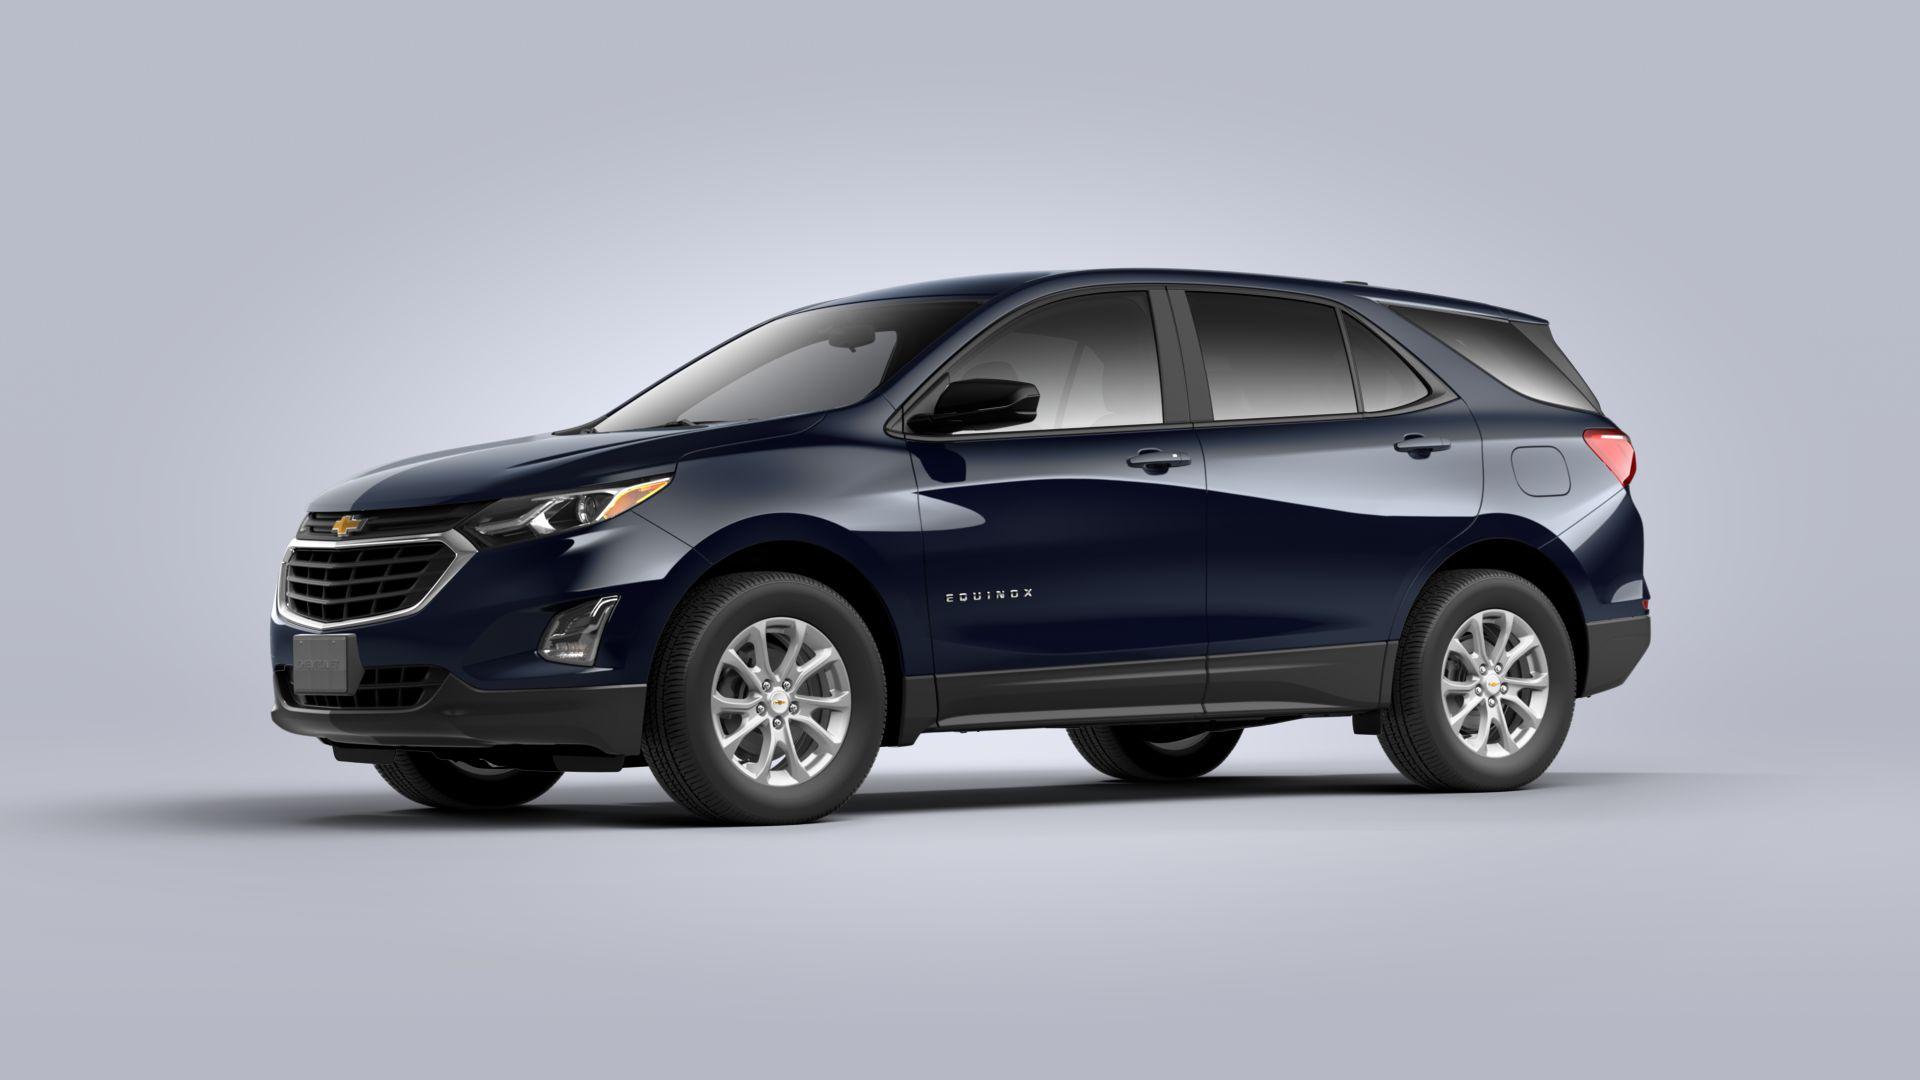 New 2021 Chevrolet Equinox LS SUV in San Antonio #XXJP05*O ...